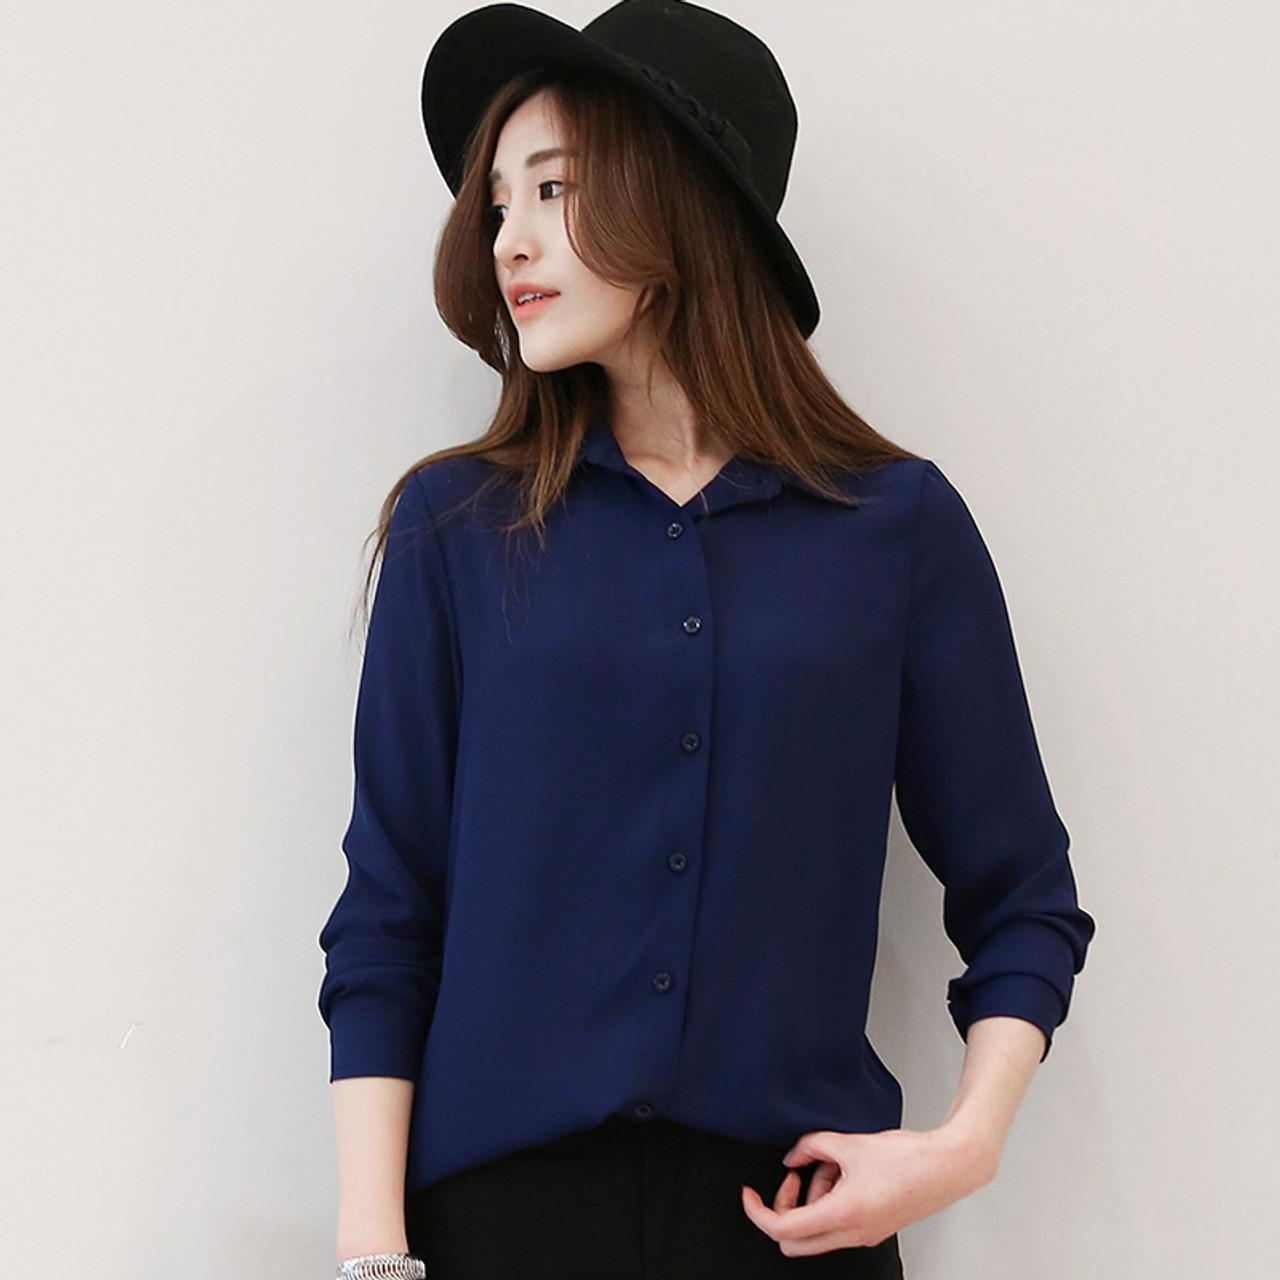 e327faea ... 2018 Hot Sale Women Shirts Blouses Long Sleeve Turn-Down Collar Solid Ladies  Chiffon Blouse ...